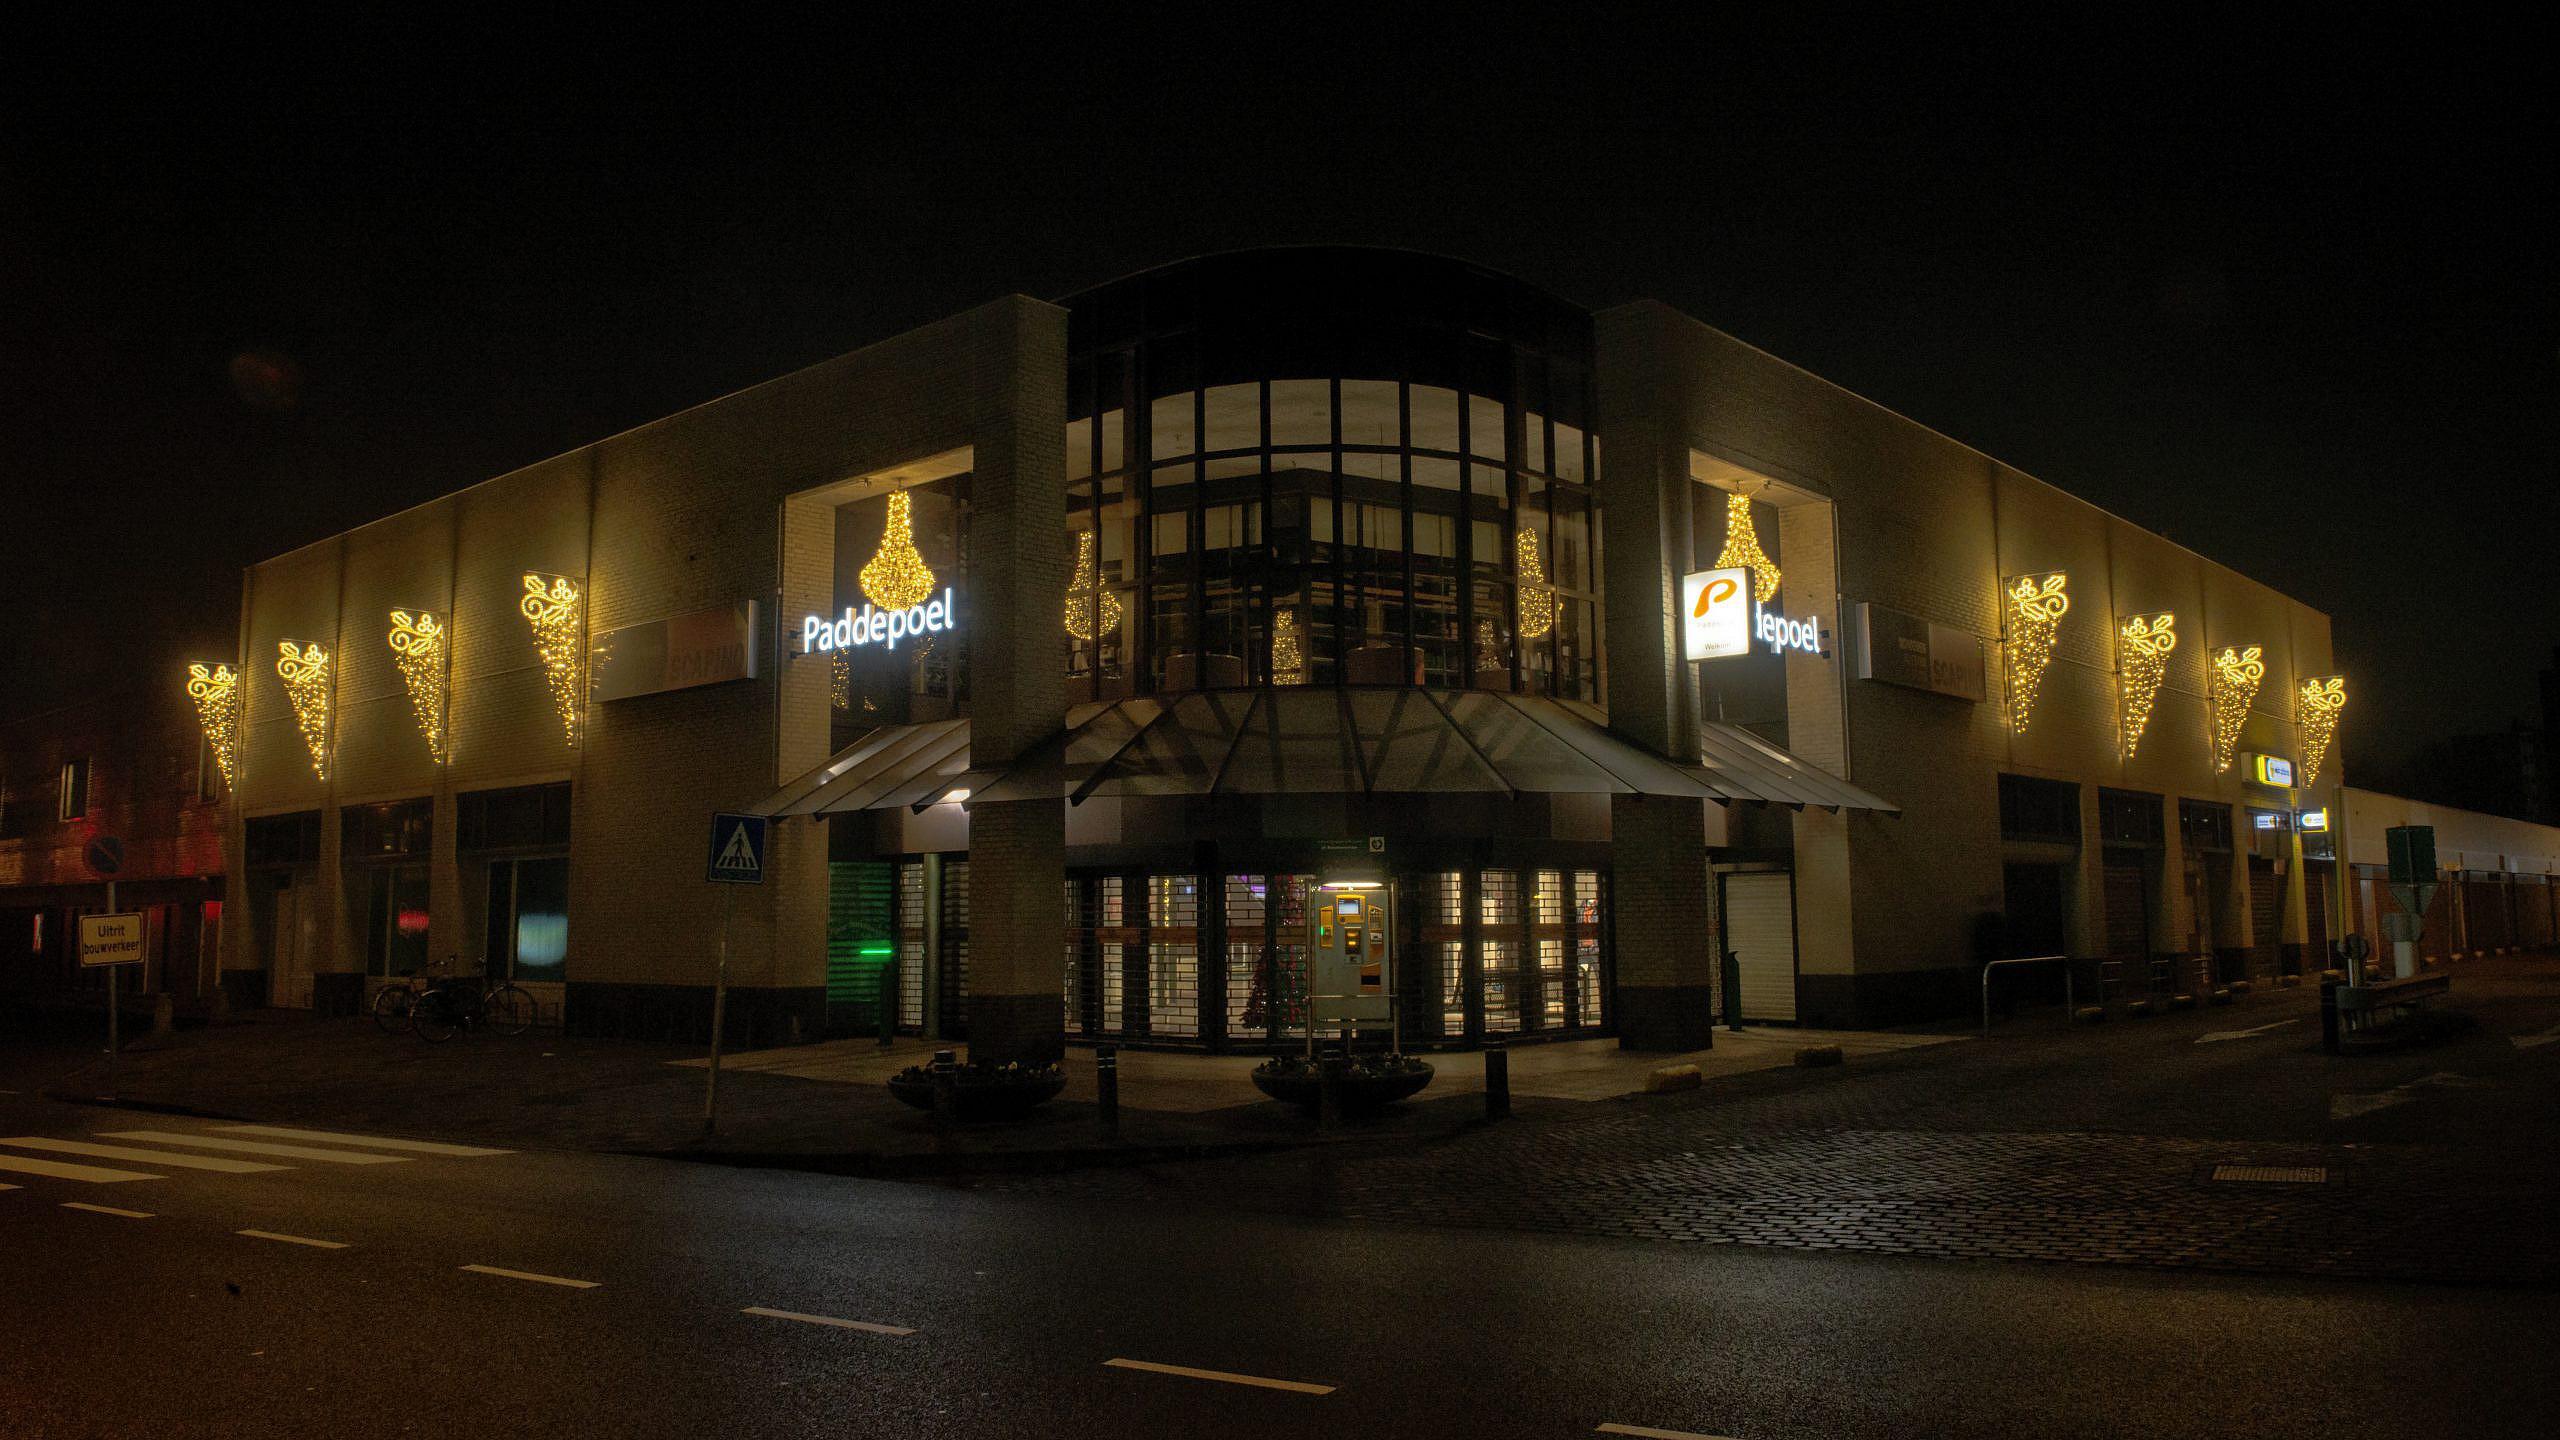 Groningen Winkelcentrum Paddepoel